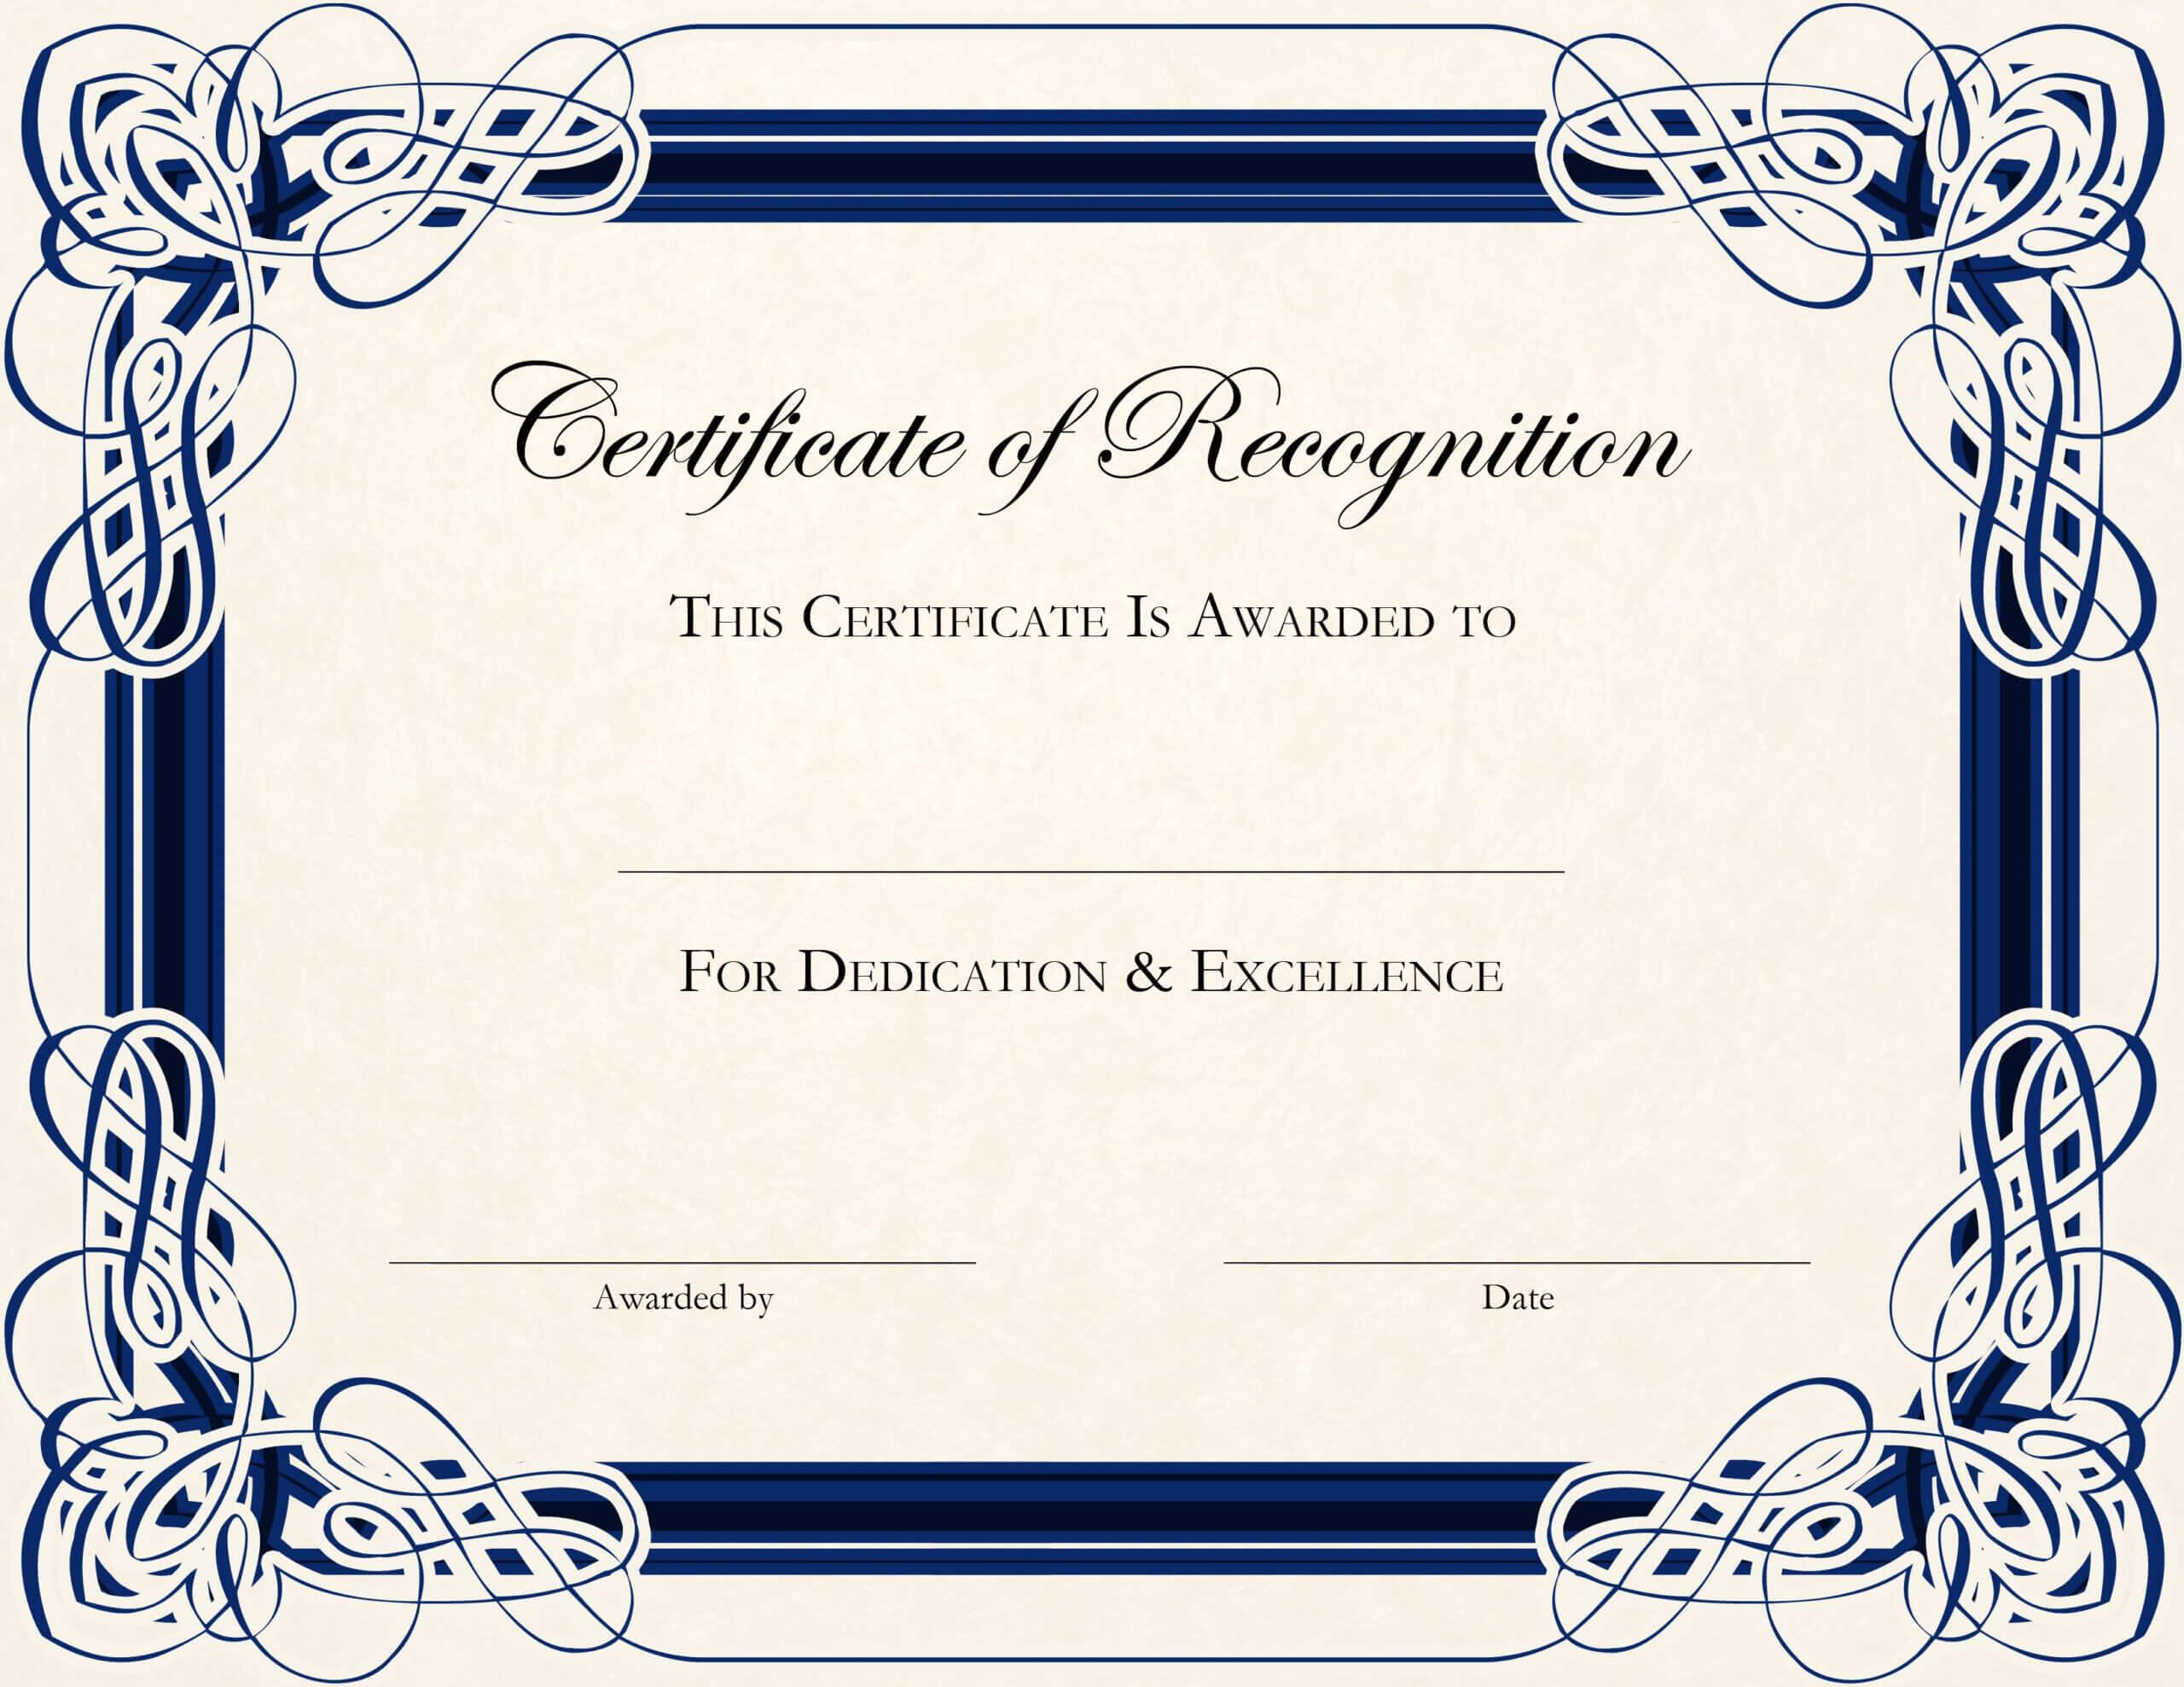 Certificate Template Designs Recognition Docs | Certificate Throughout Template For Certificate Of Award